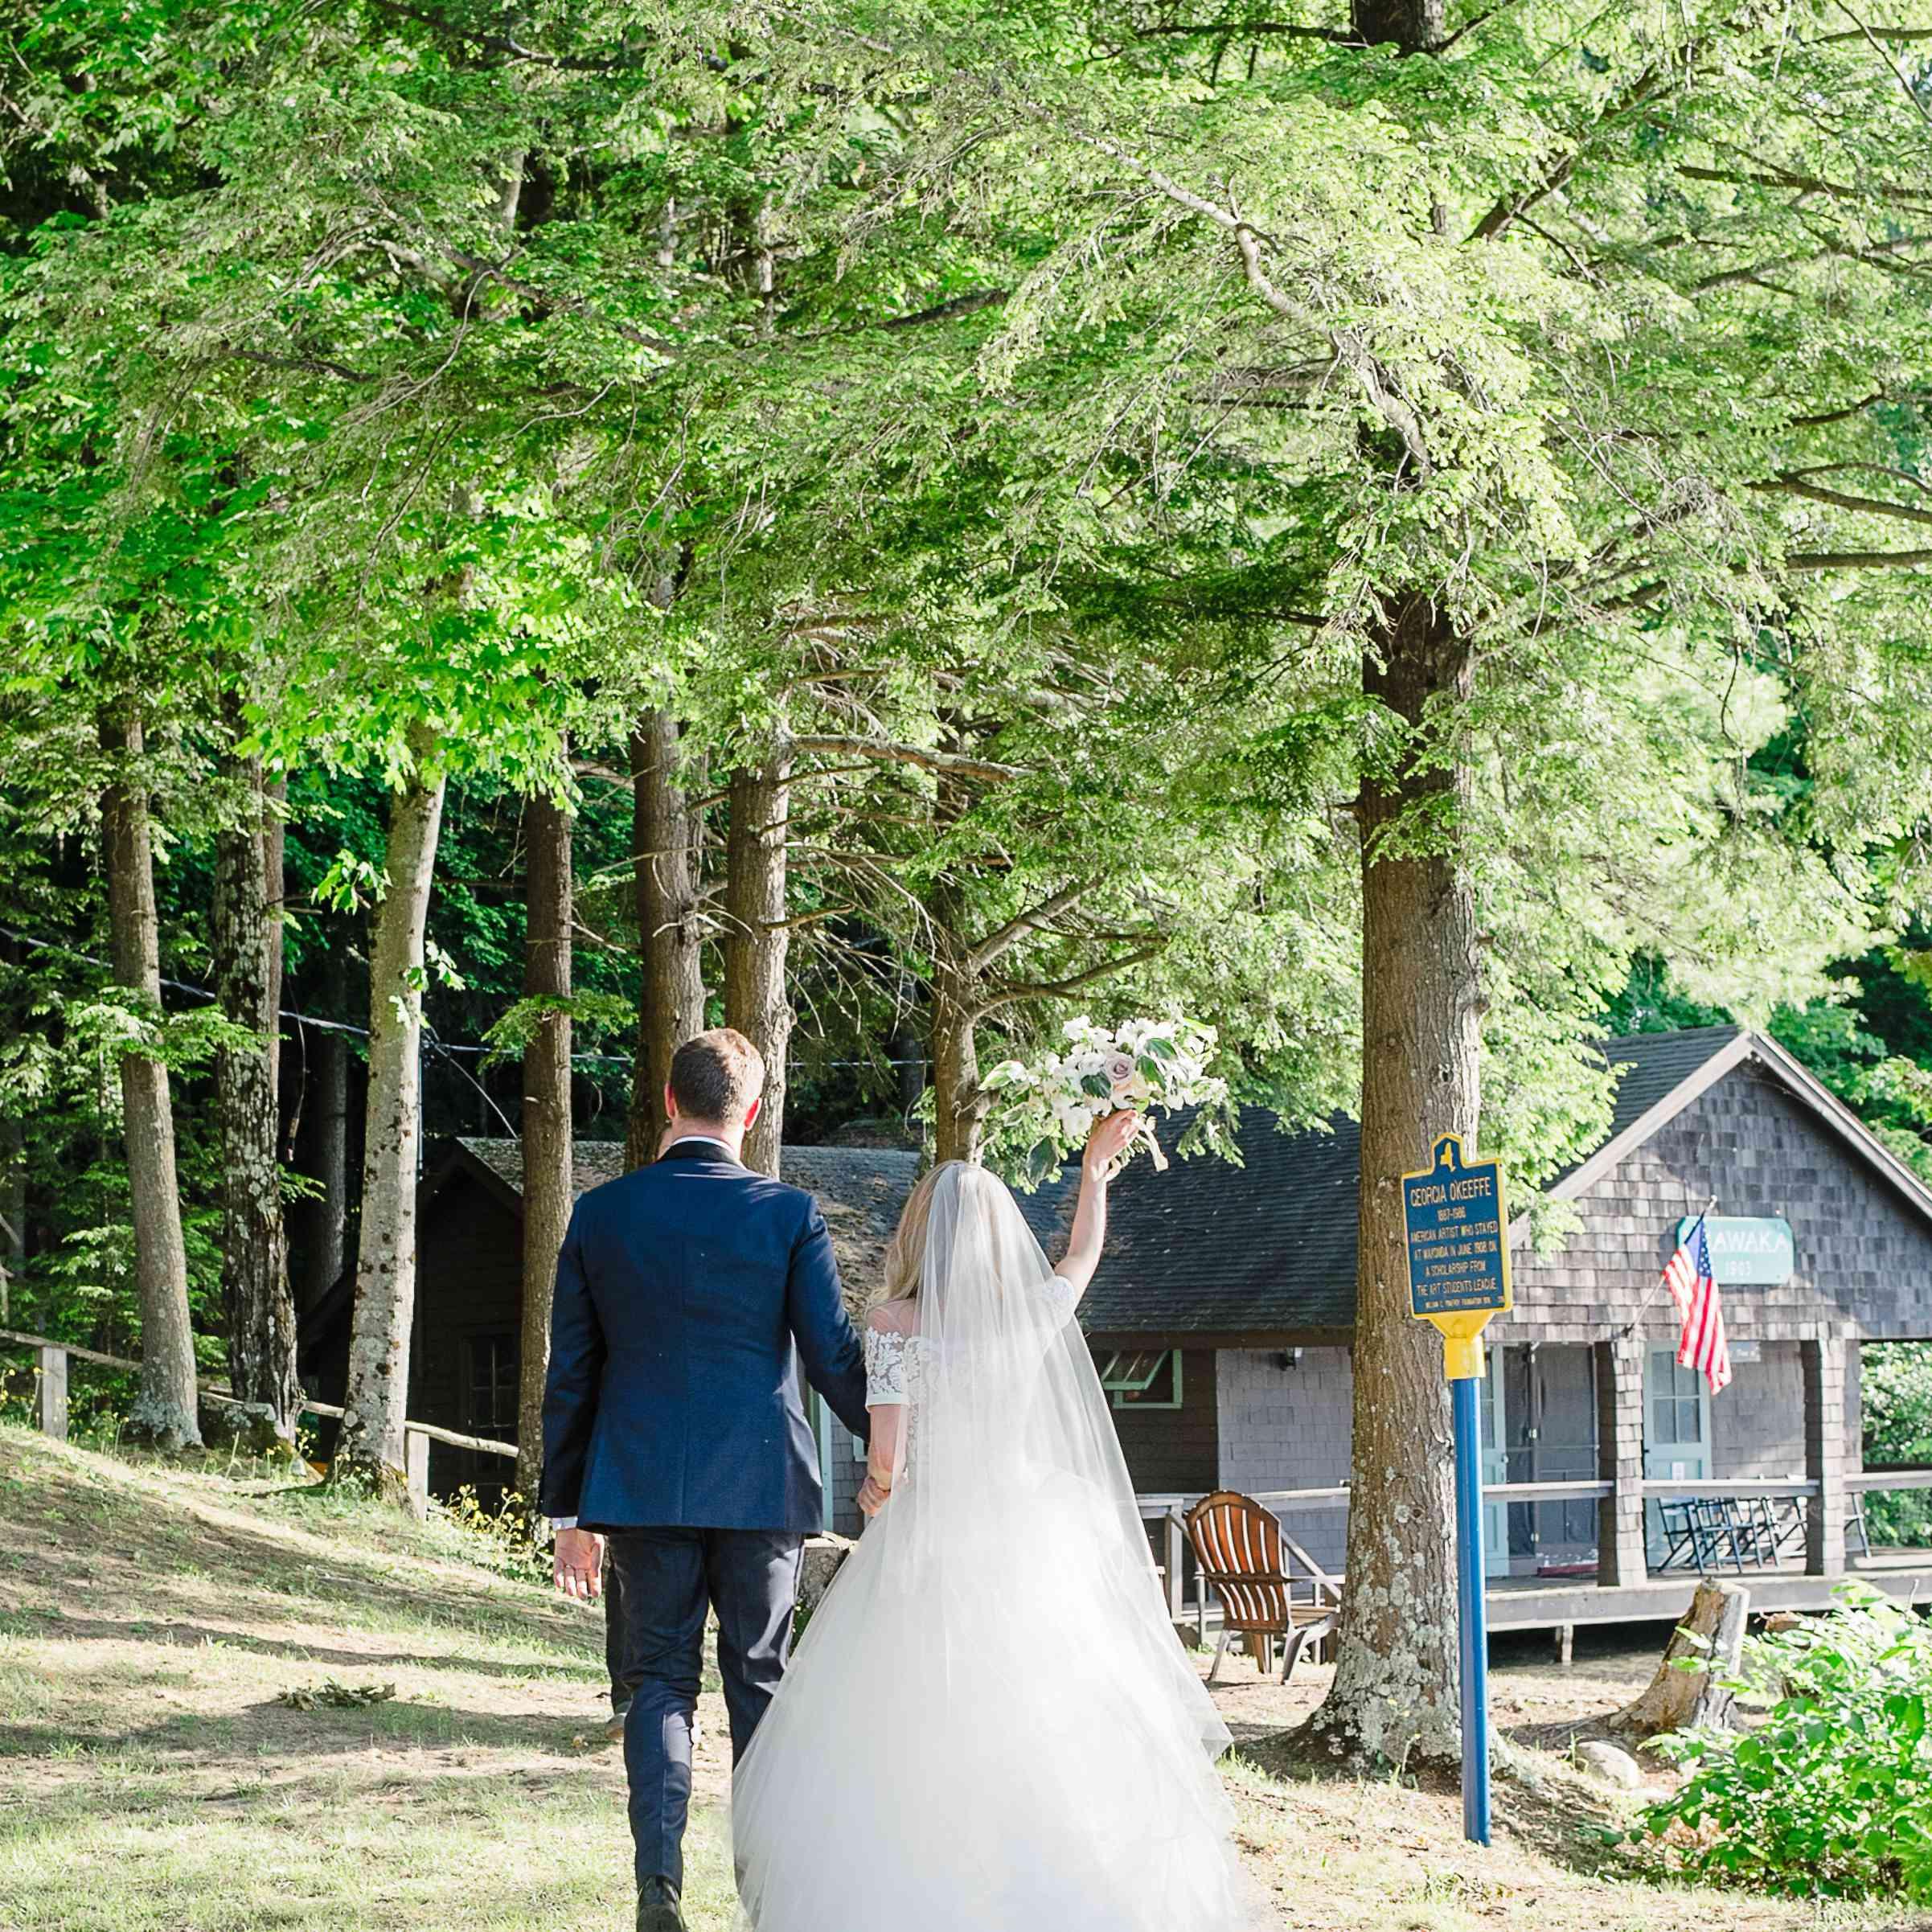 <p>Bride and groom near cabin</p><br><br>